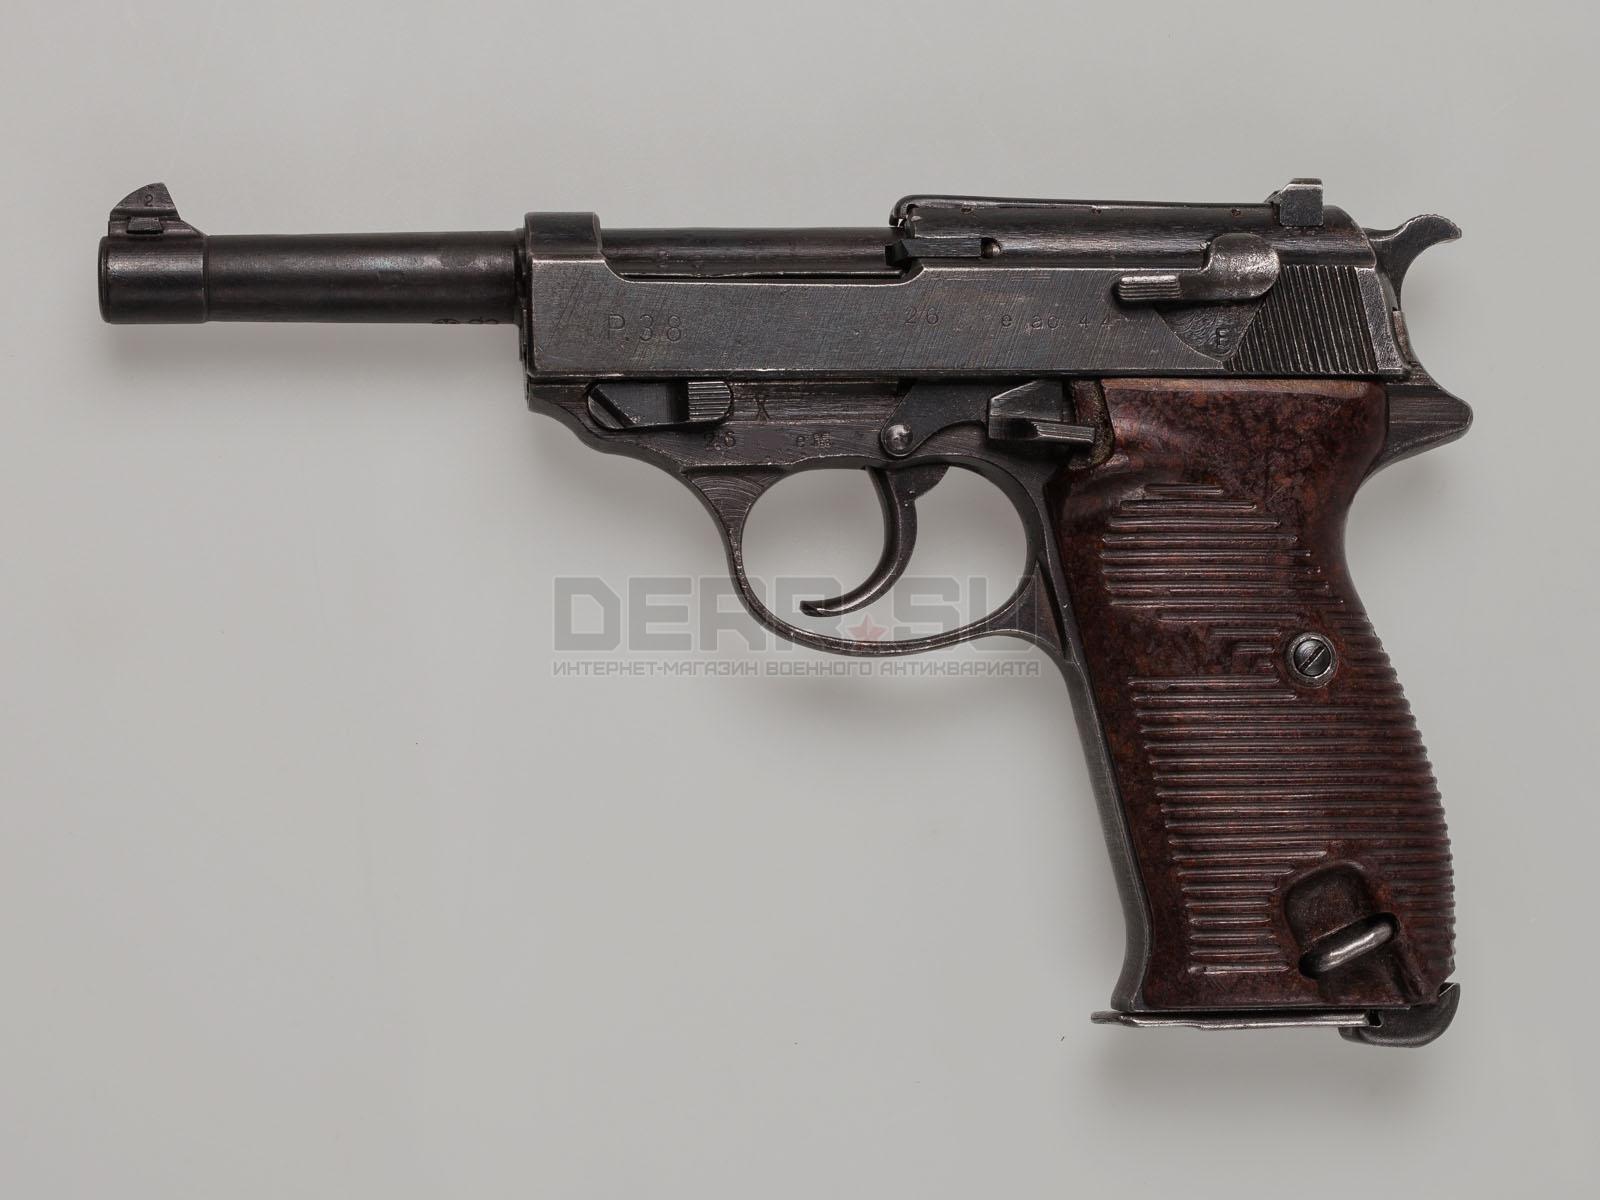 https://static1.derr.su/5936-thickbox_default/oholoshyonnyy-pistolet-walther-p-38.jpg